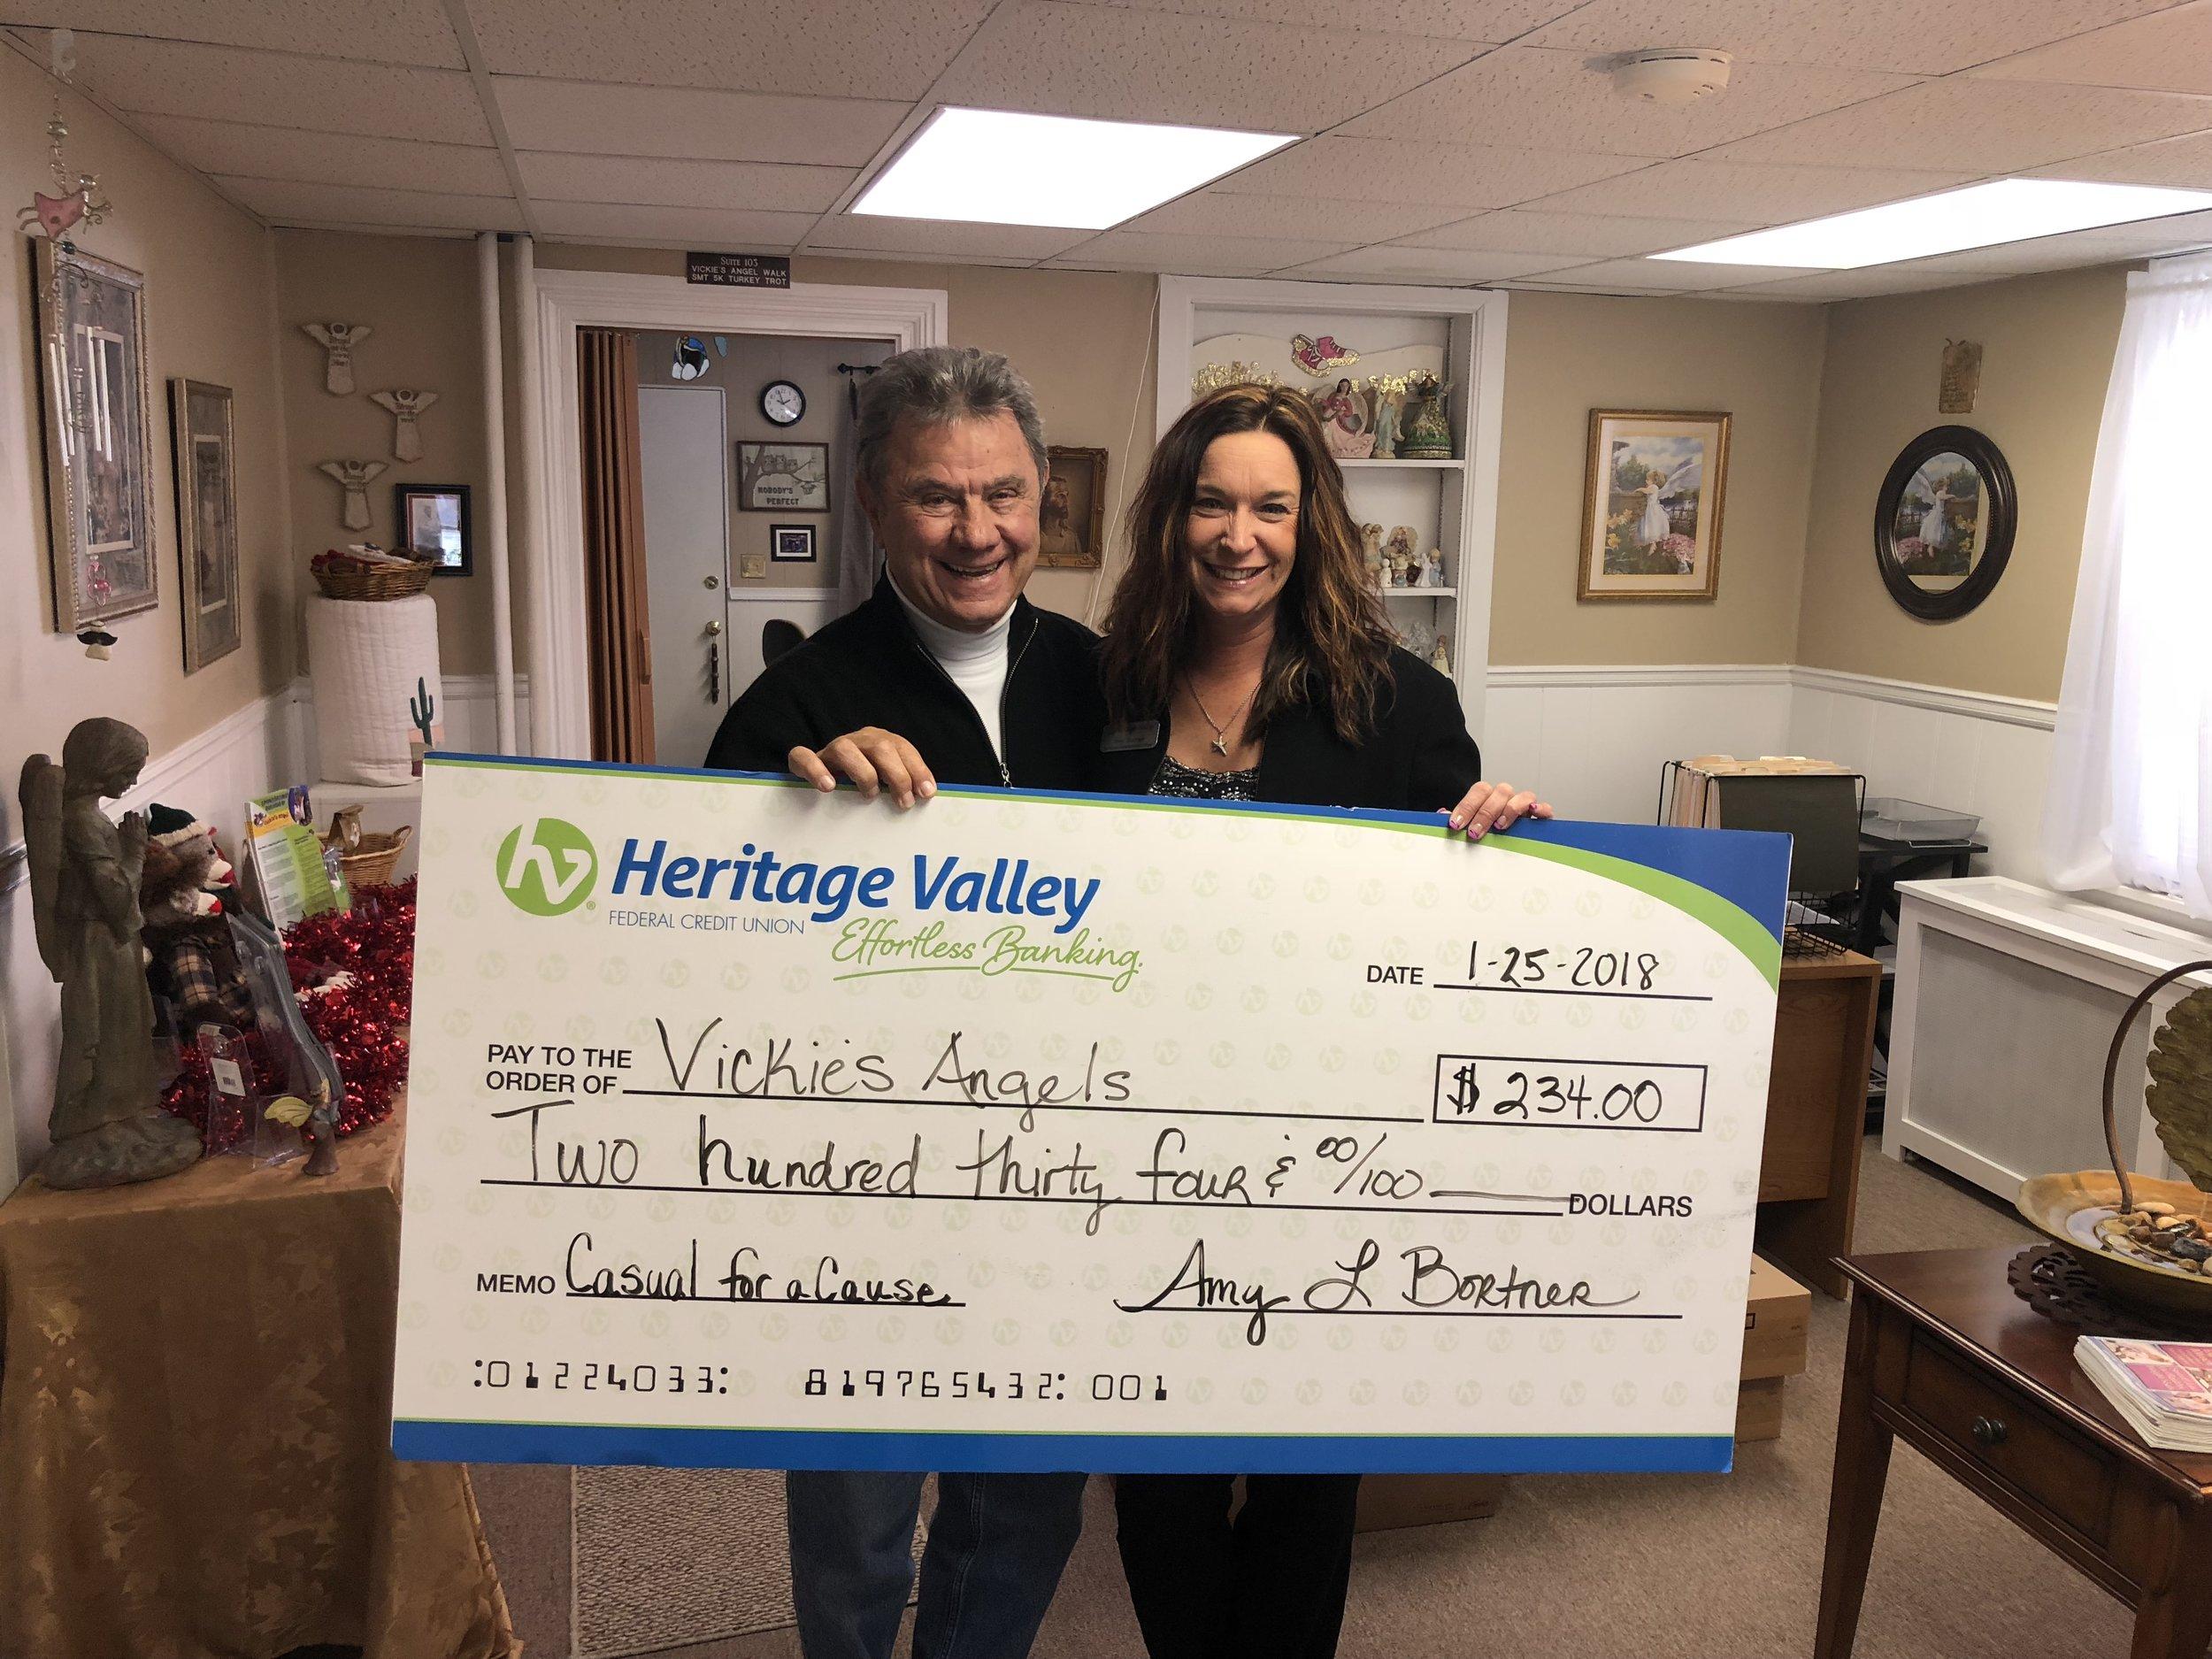 Heritage Valley Bank.jpg